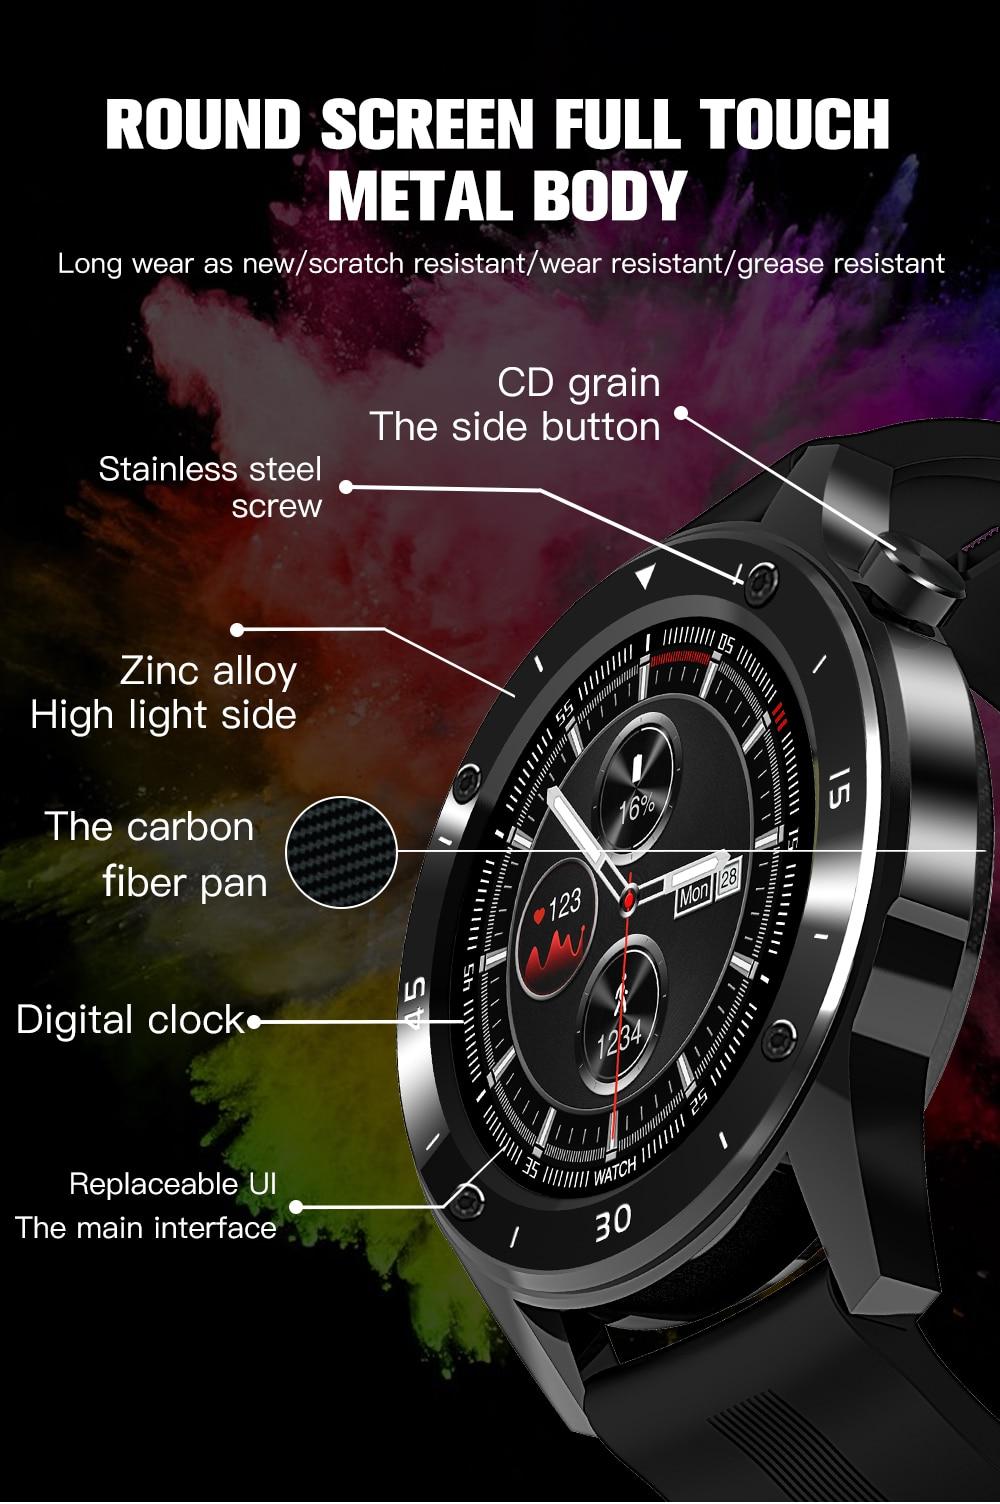 CZJW F22S Sport Smart Watches for man woman 2020 gift intelFrishaynt smartwatch fitness tracker bracelet blood pressure android ios